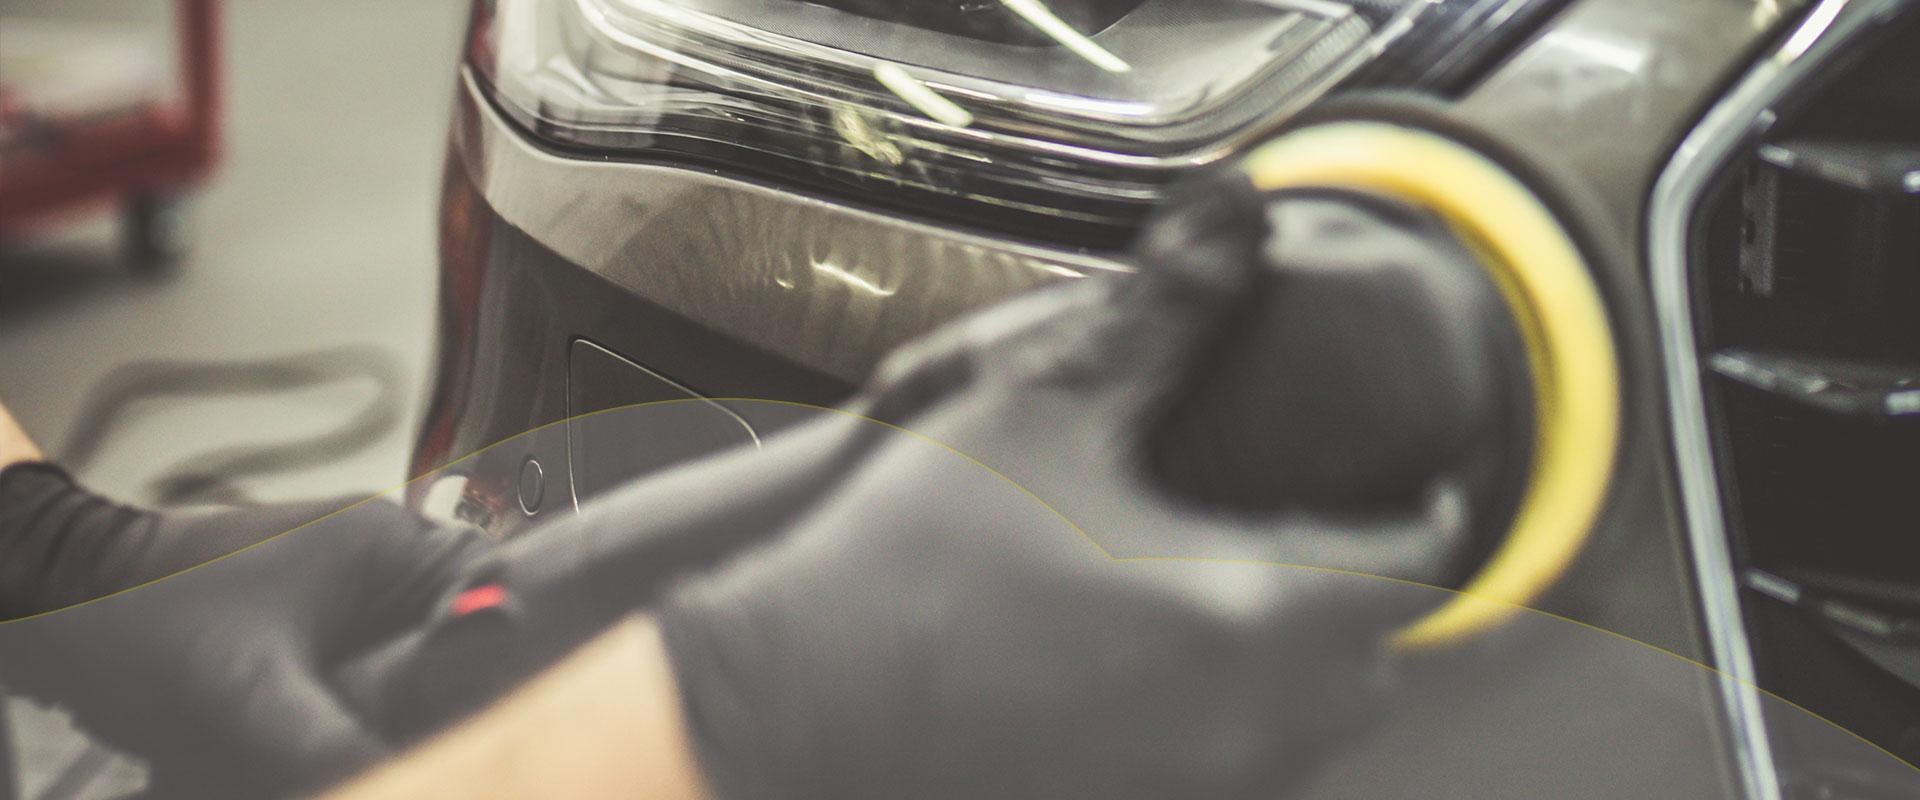 Auto Lackpflege Politur